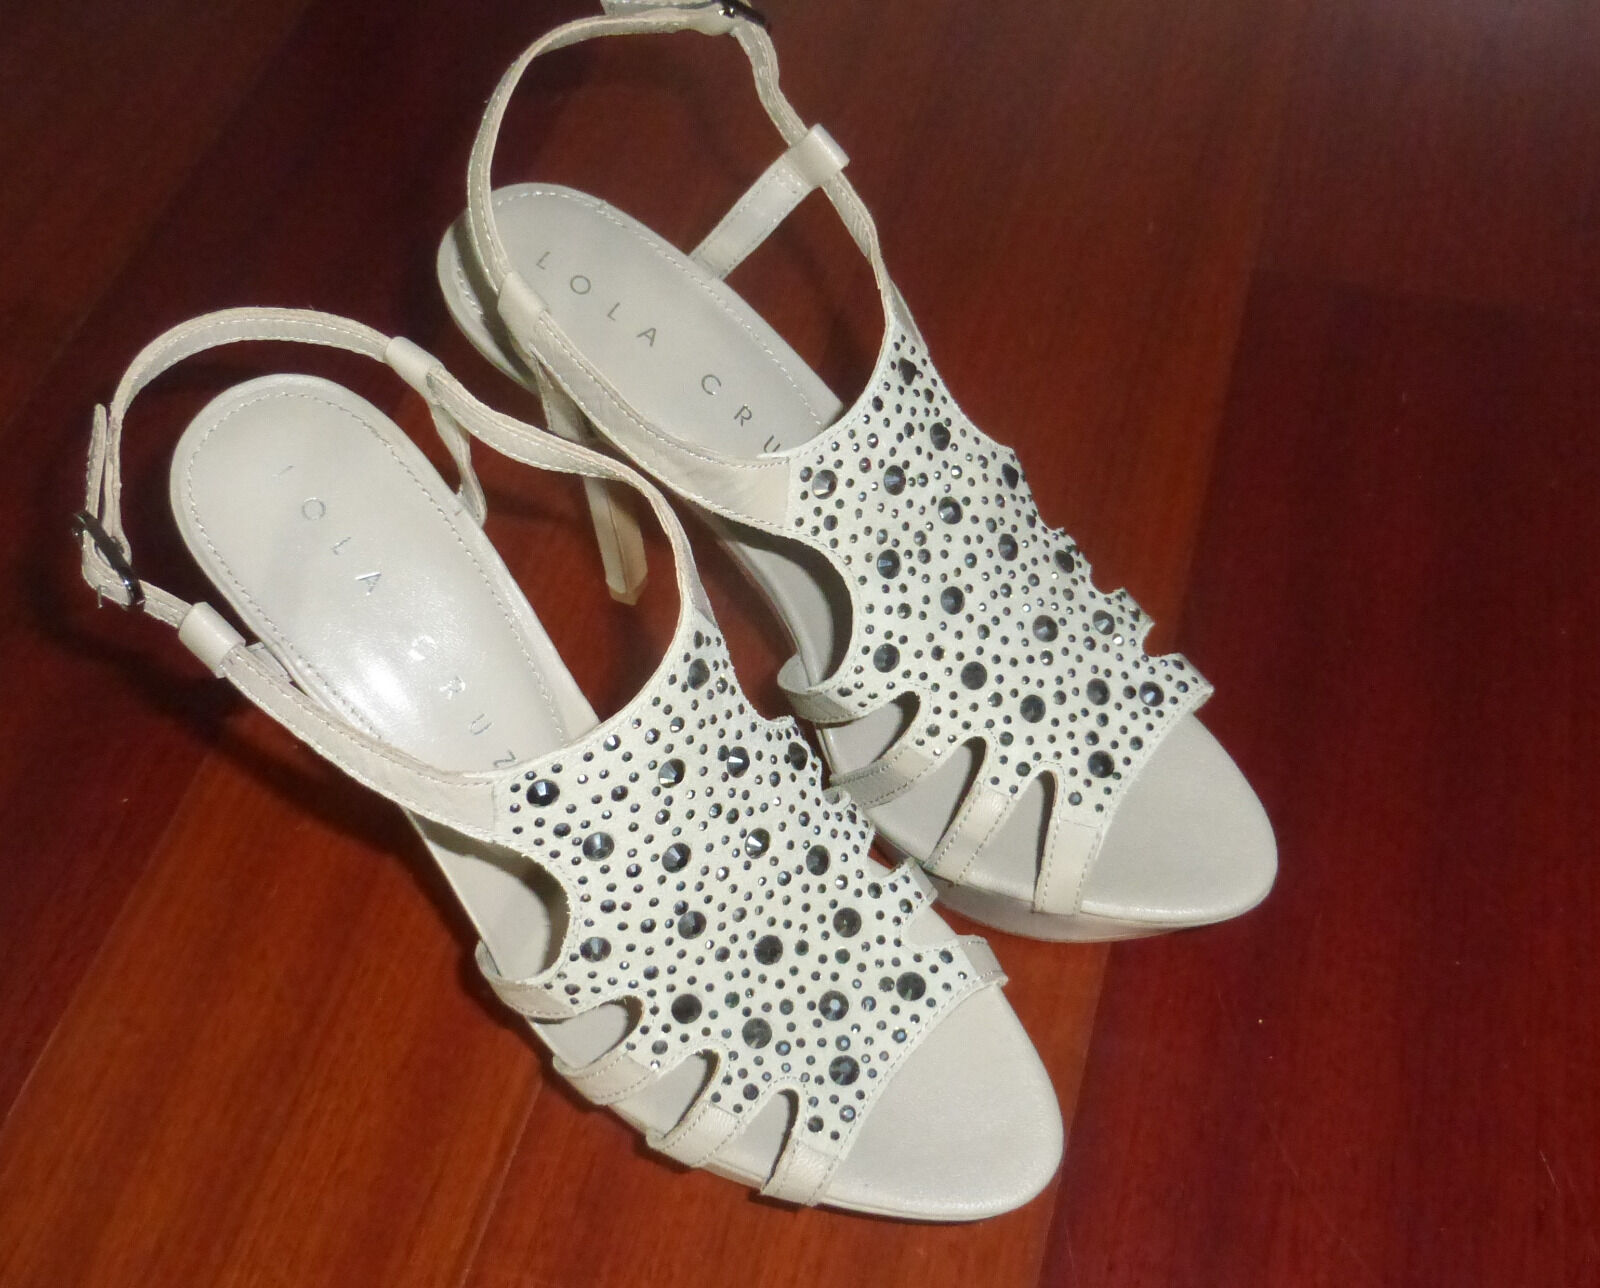 Lola Cruz Leder Schuhe High Heels Größe 38 Sandaleette Plateau Sandale